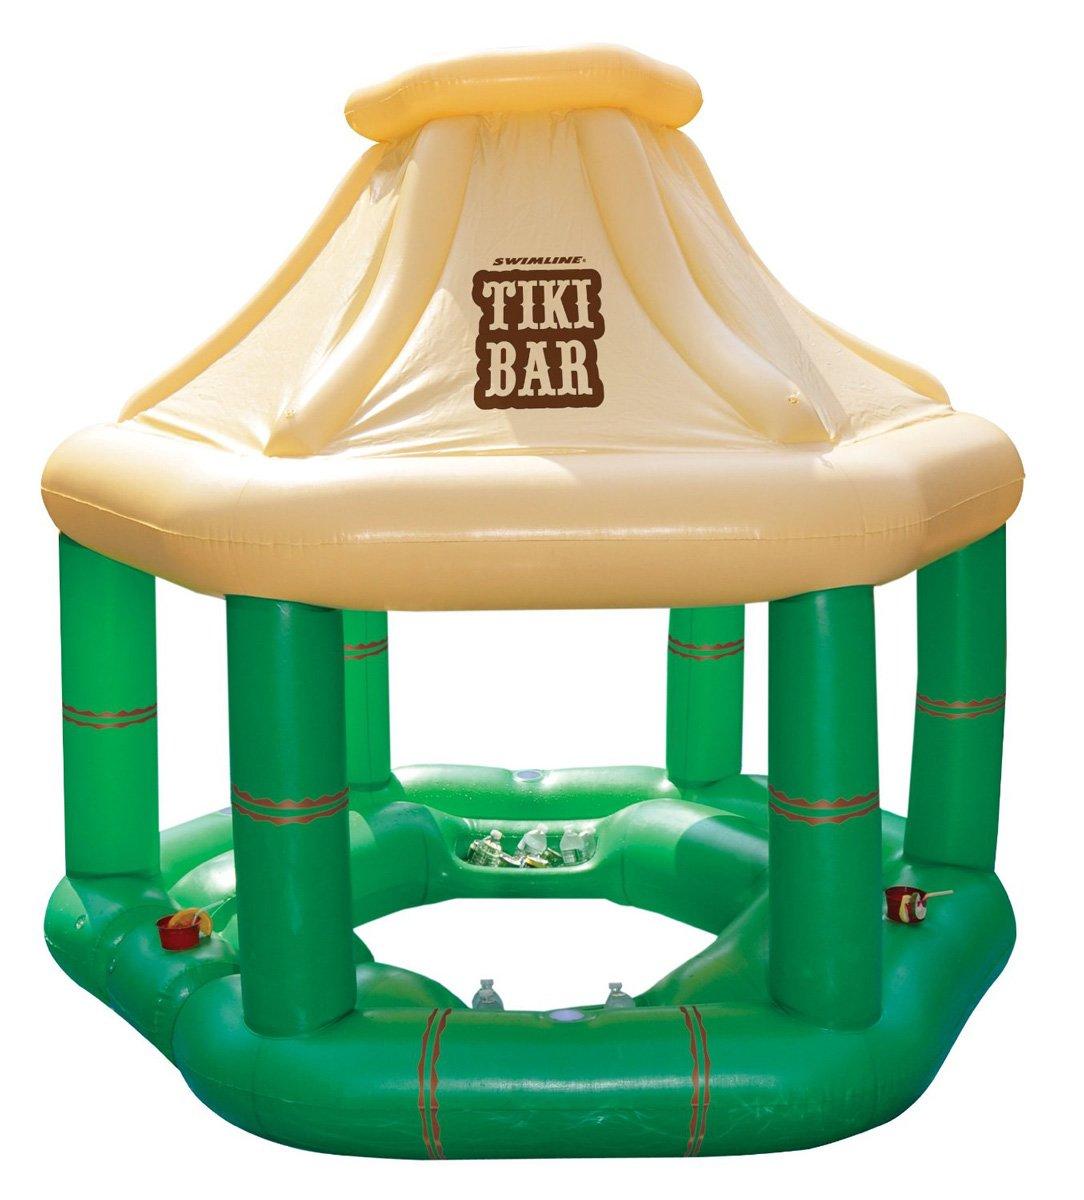 Floating pool bar - Inflatable Floating Swim Up Tiki Bar